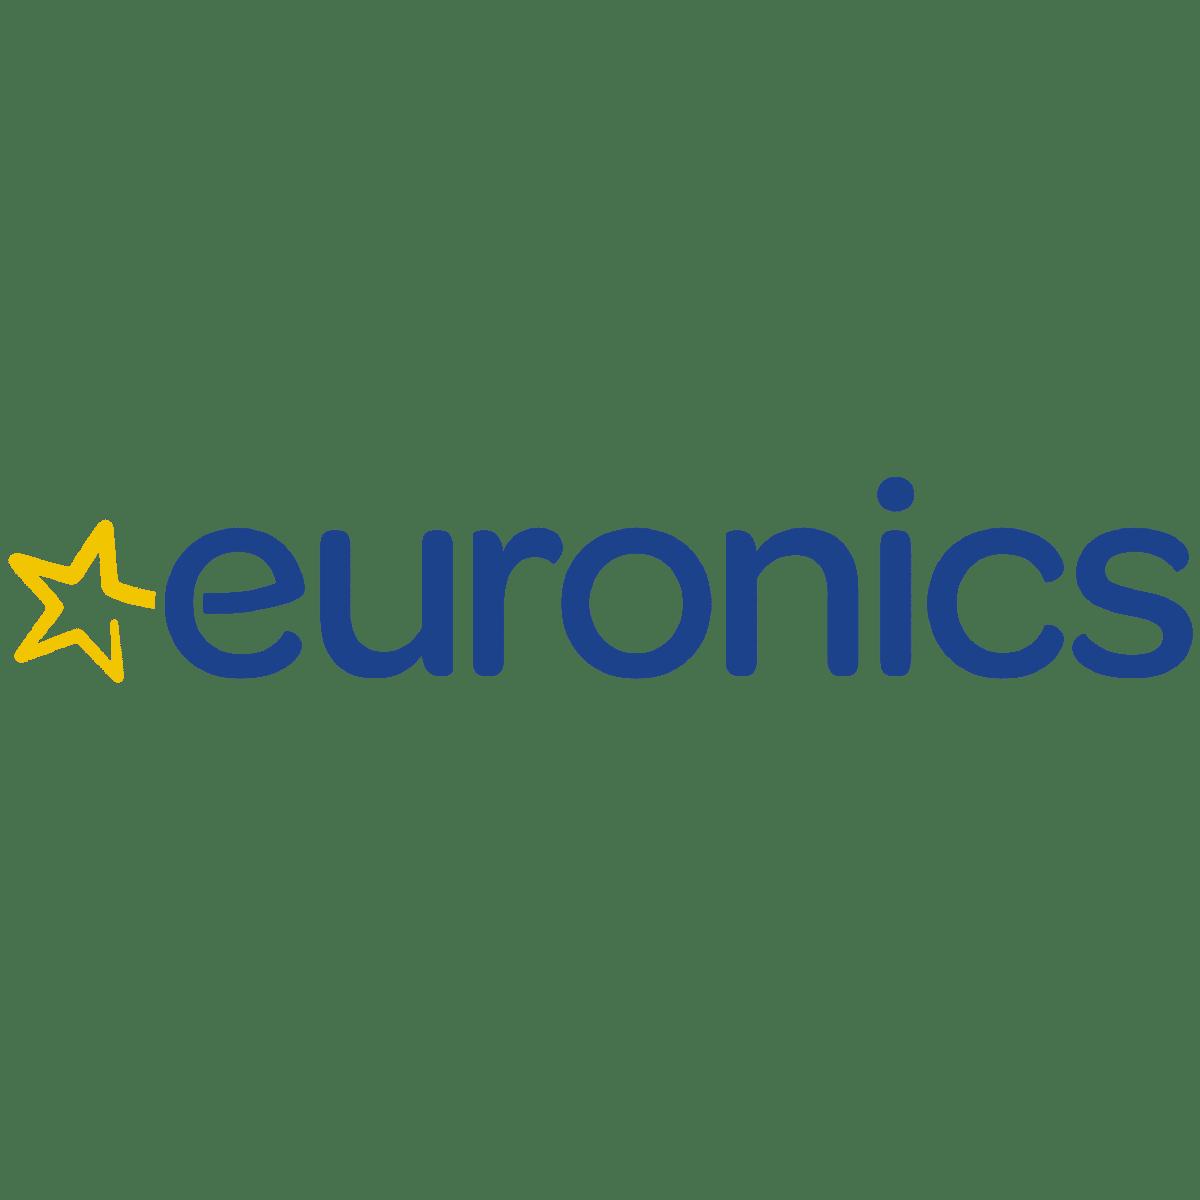 Offerte Euronics Volantino Prodotti Promozioni Prezzi